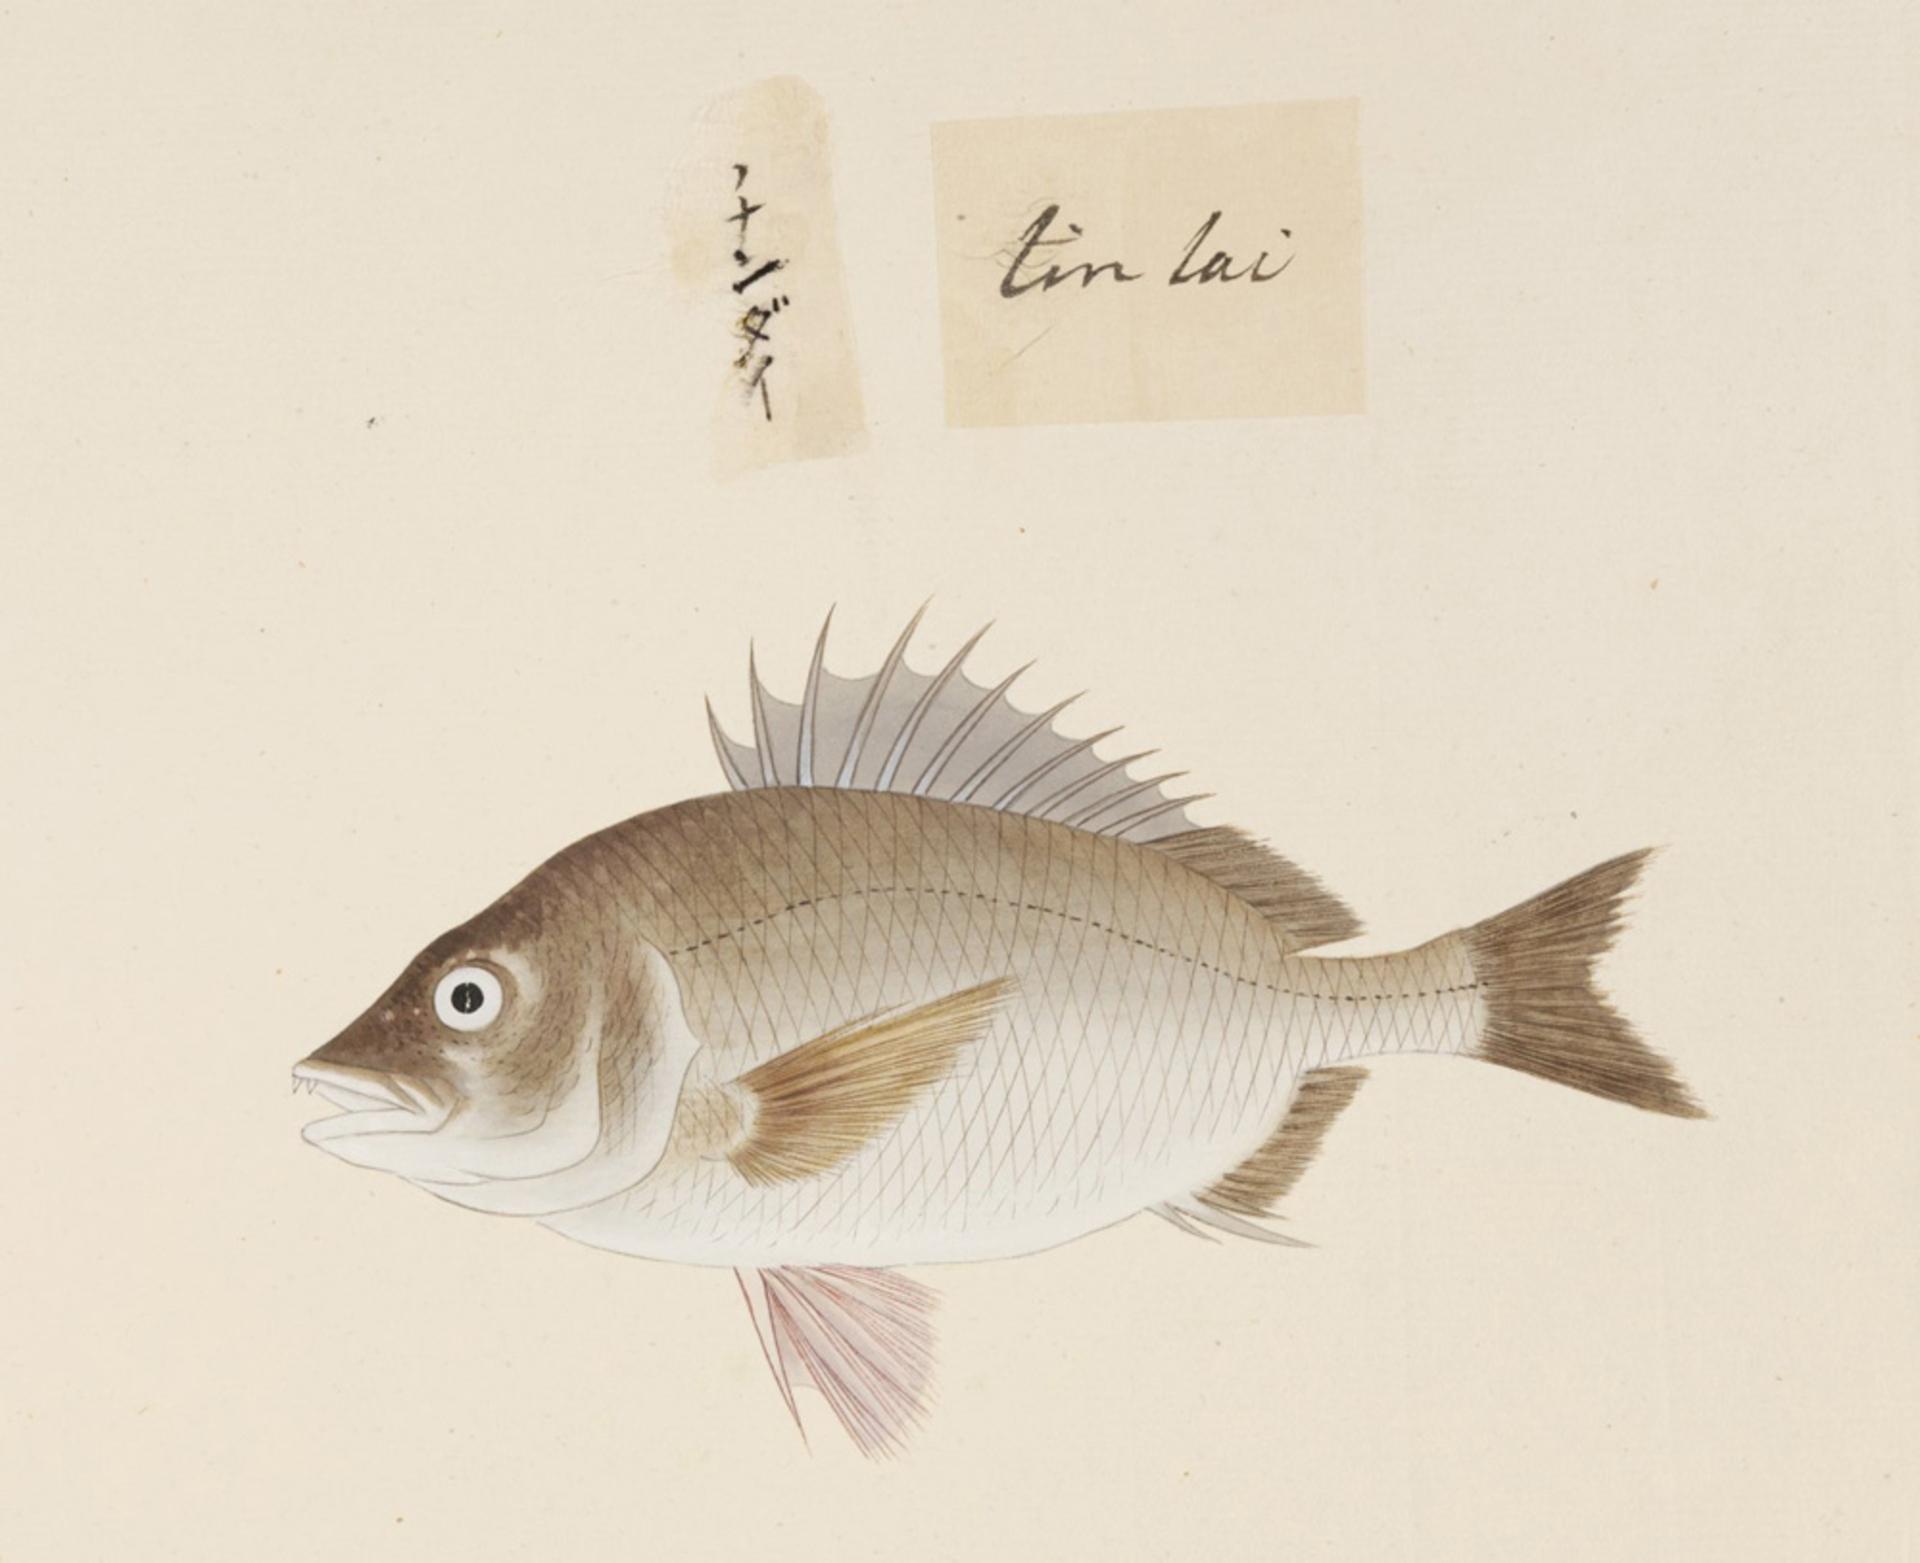 RMNH.ART.501 | Acanthopagrus schlegelii